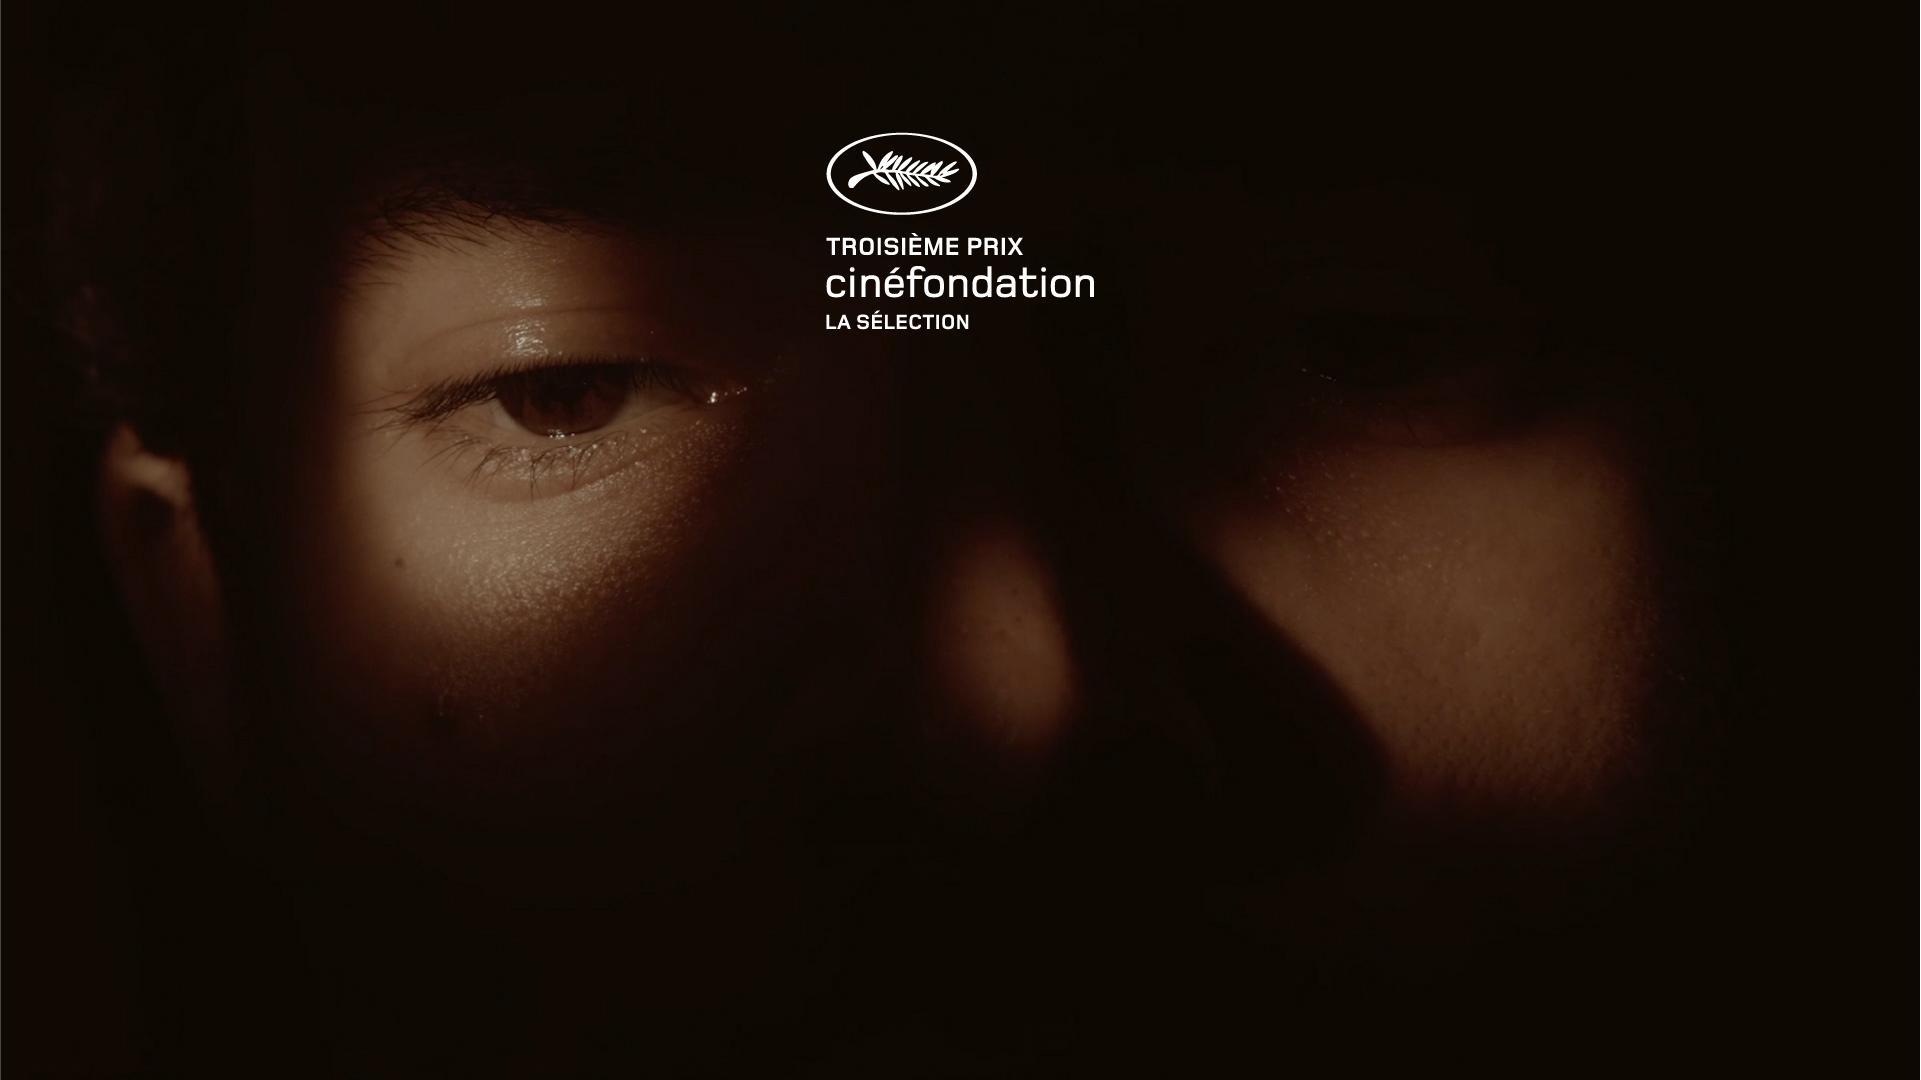 Festival de Cannes premia 'Cantareira', do ex-aluno Rodrigo Ribeyro